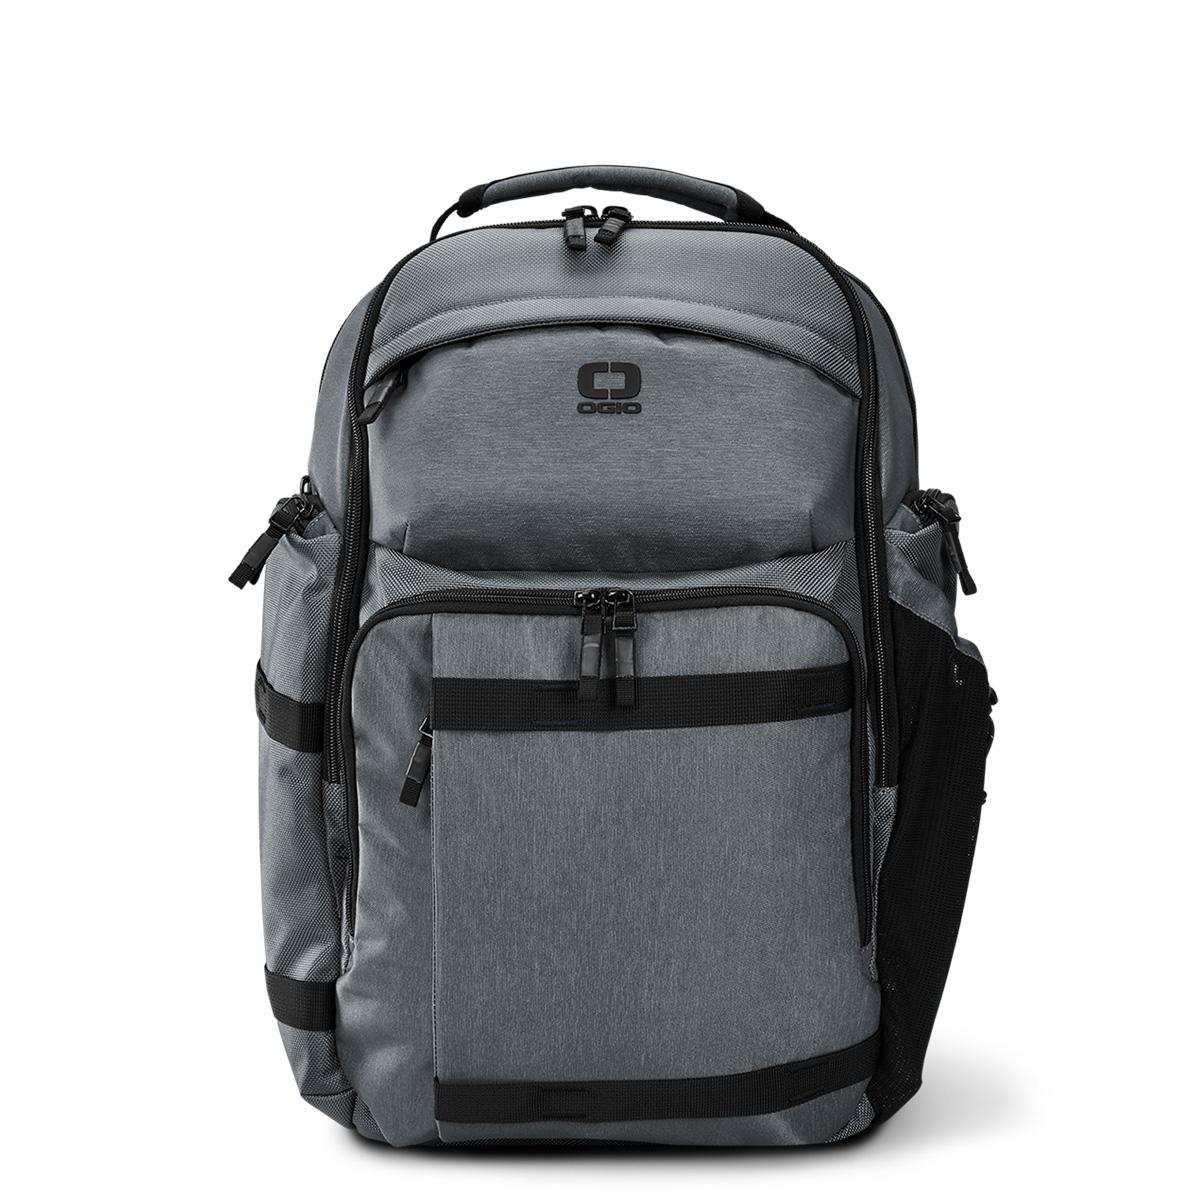 OGIO PACE 25 BACKPACK オジオ リュック バッグ バックパック ビジネスバッグ メンズ レディース 25L ヘザー グレー 5920193OG